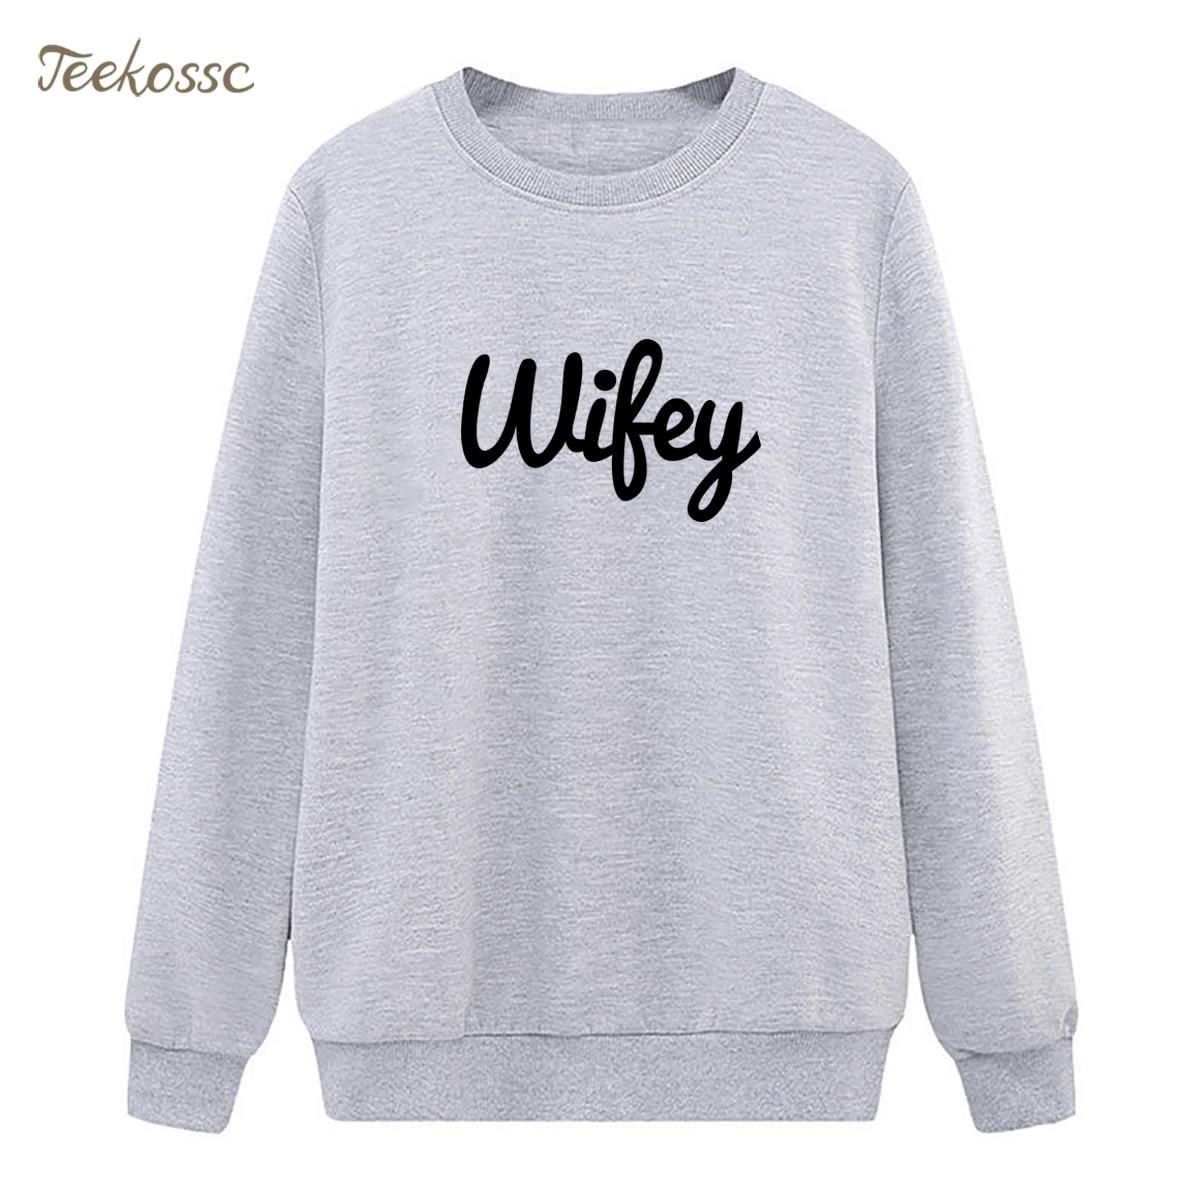 New Arrival WIFEY Letters Print Sweatshirt Casual Funny Hoodie Winter Autumn Women Lasdies Pullover Loose Fleece Brand Clothing